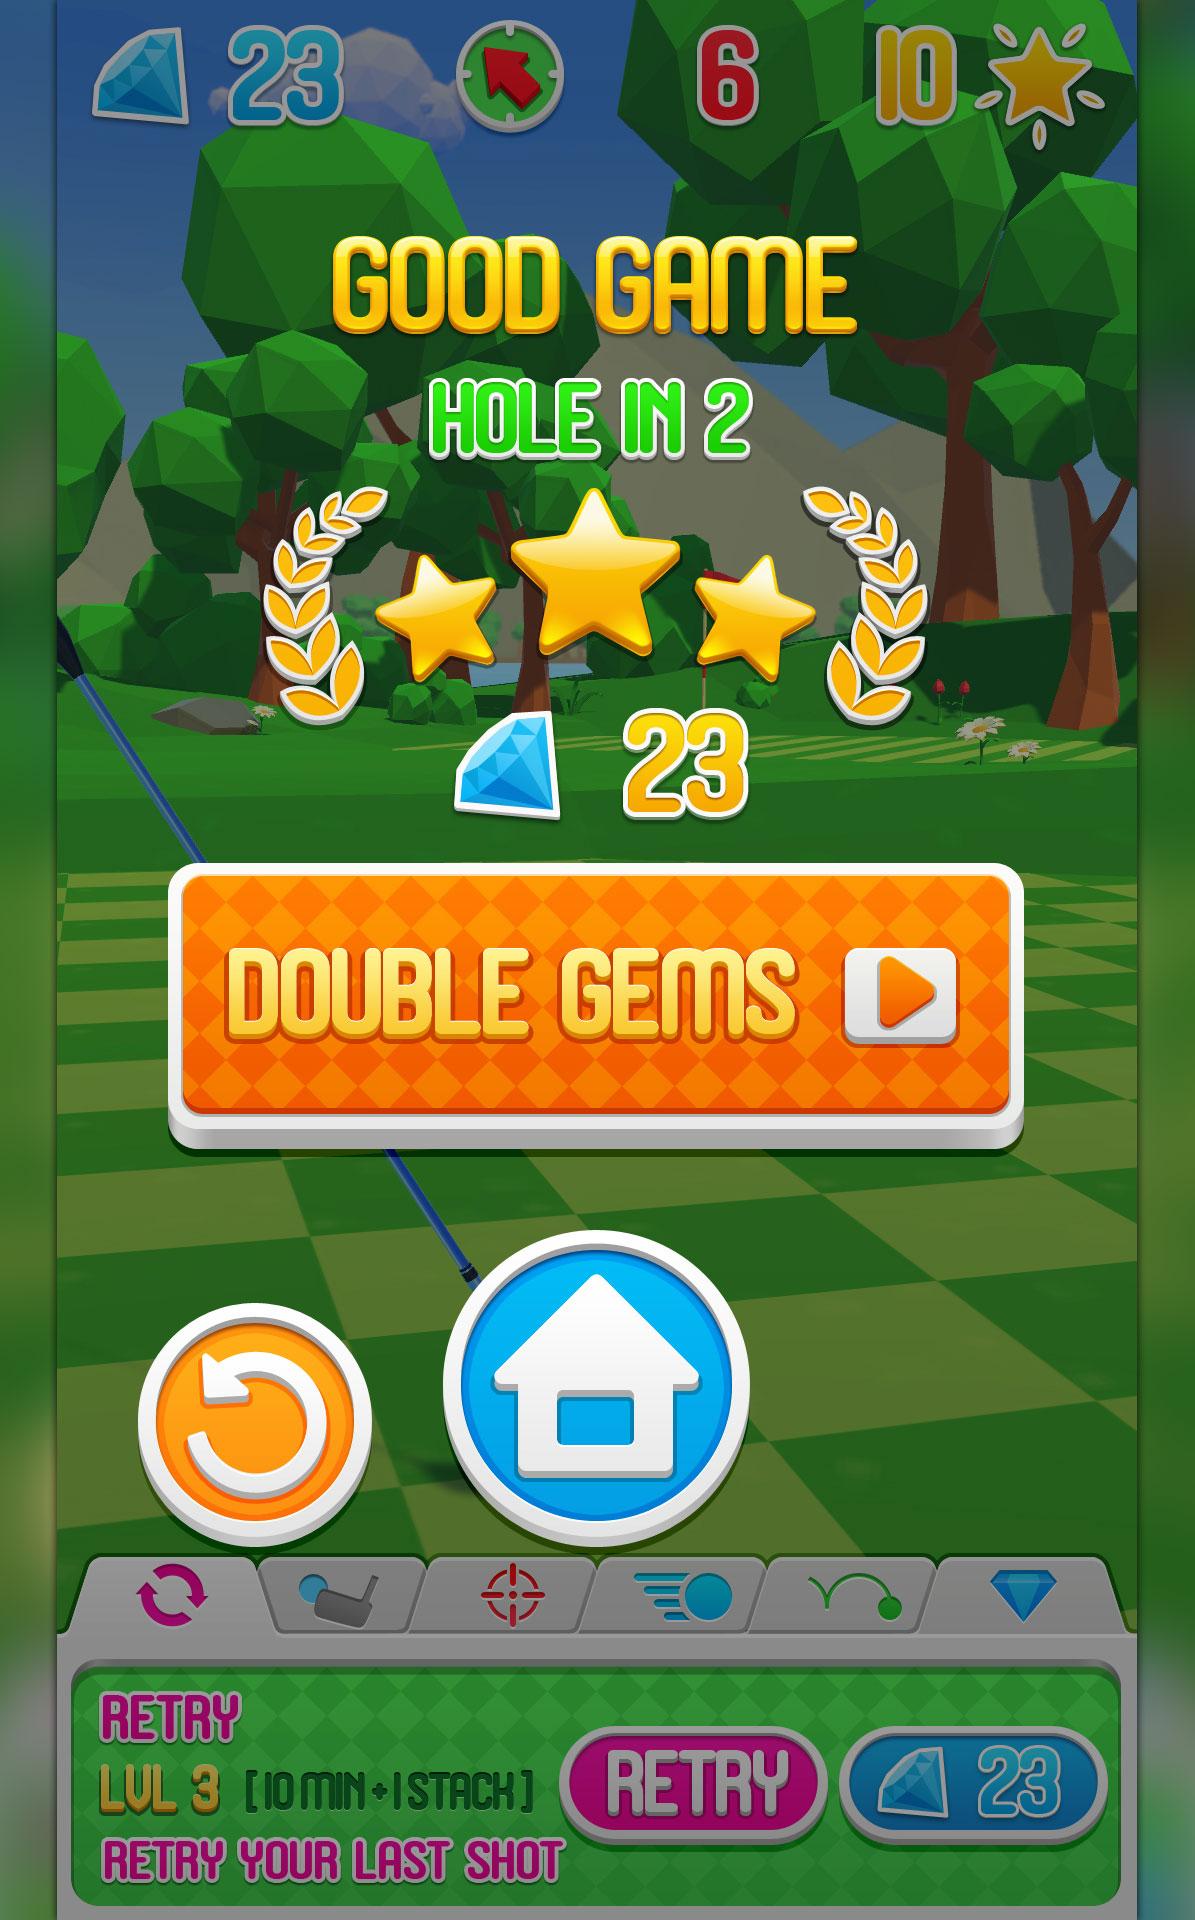 Golf_Planet_Good-Game